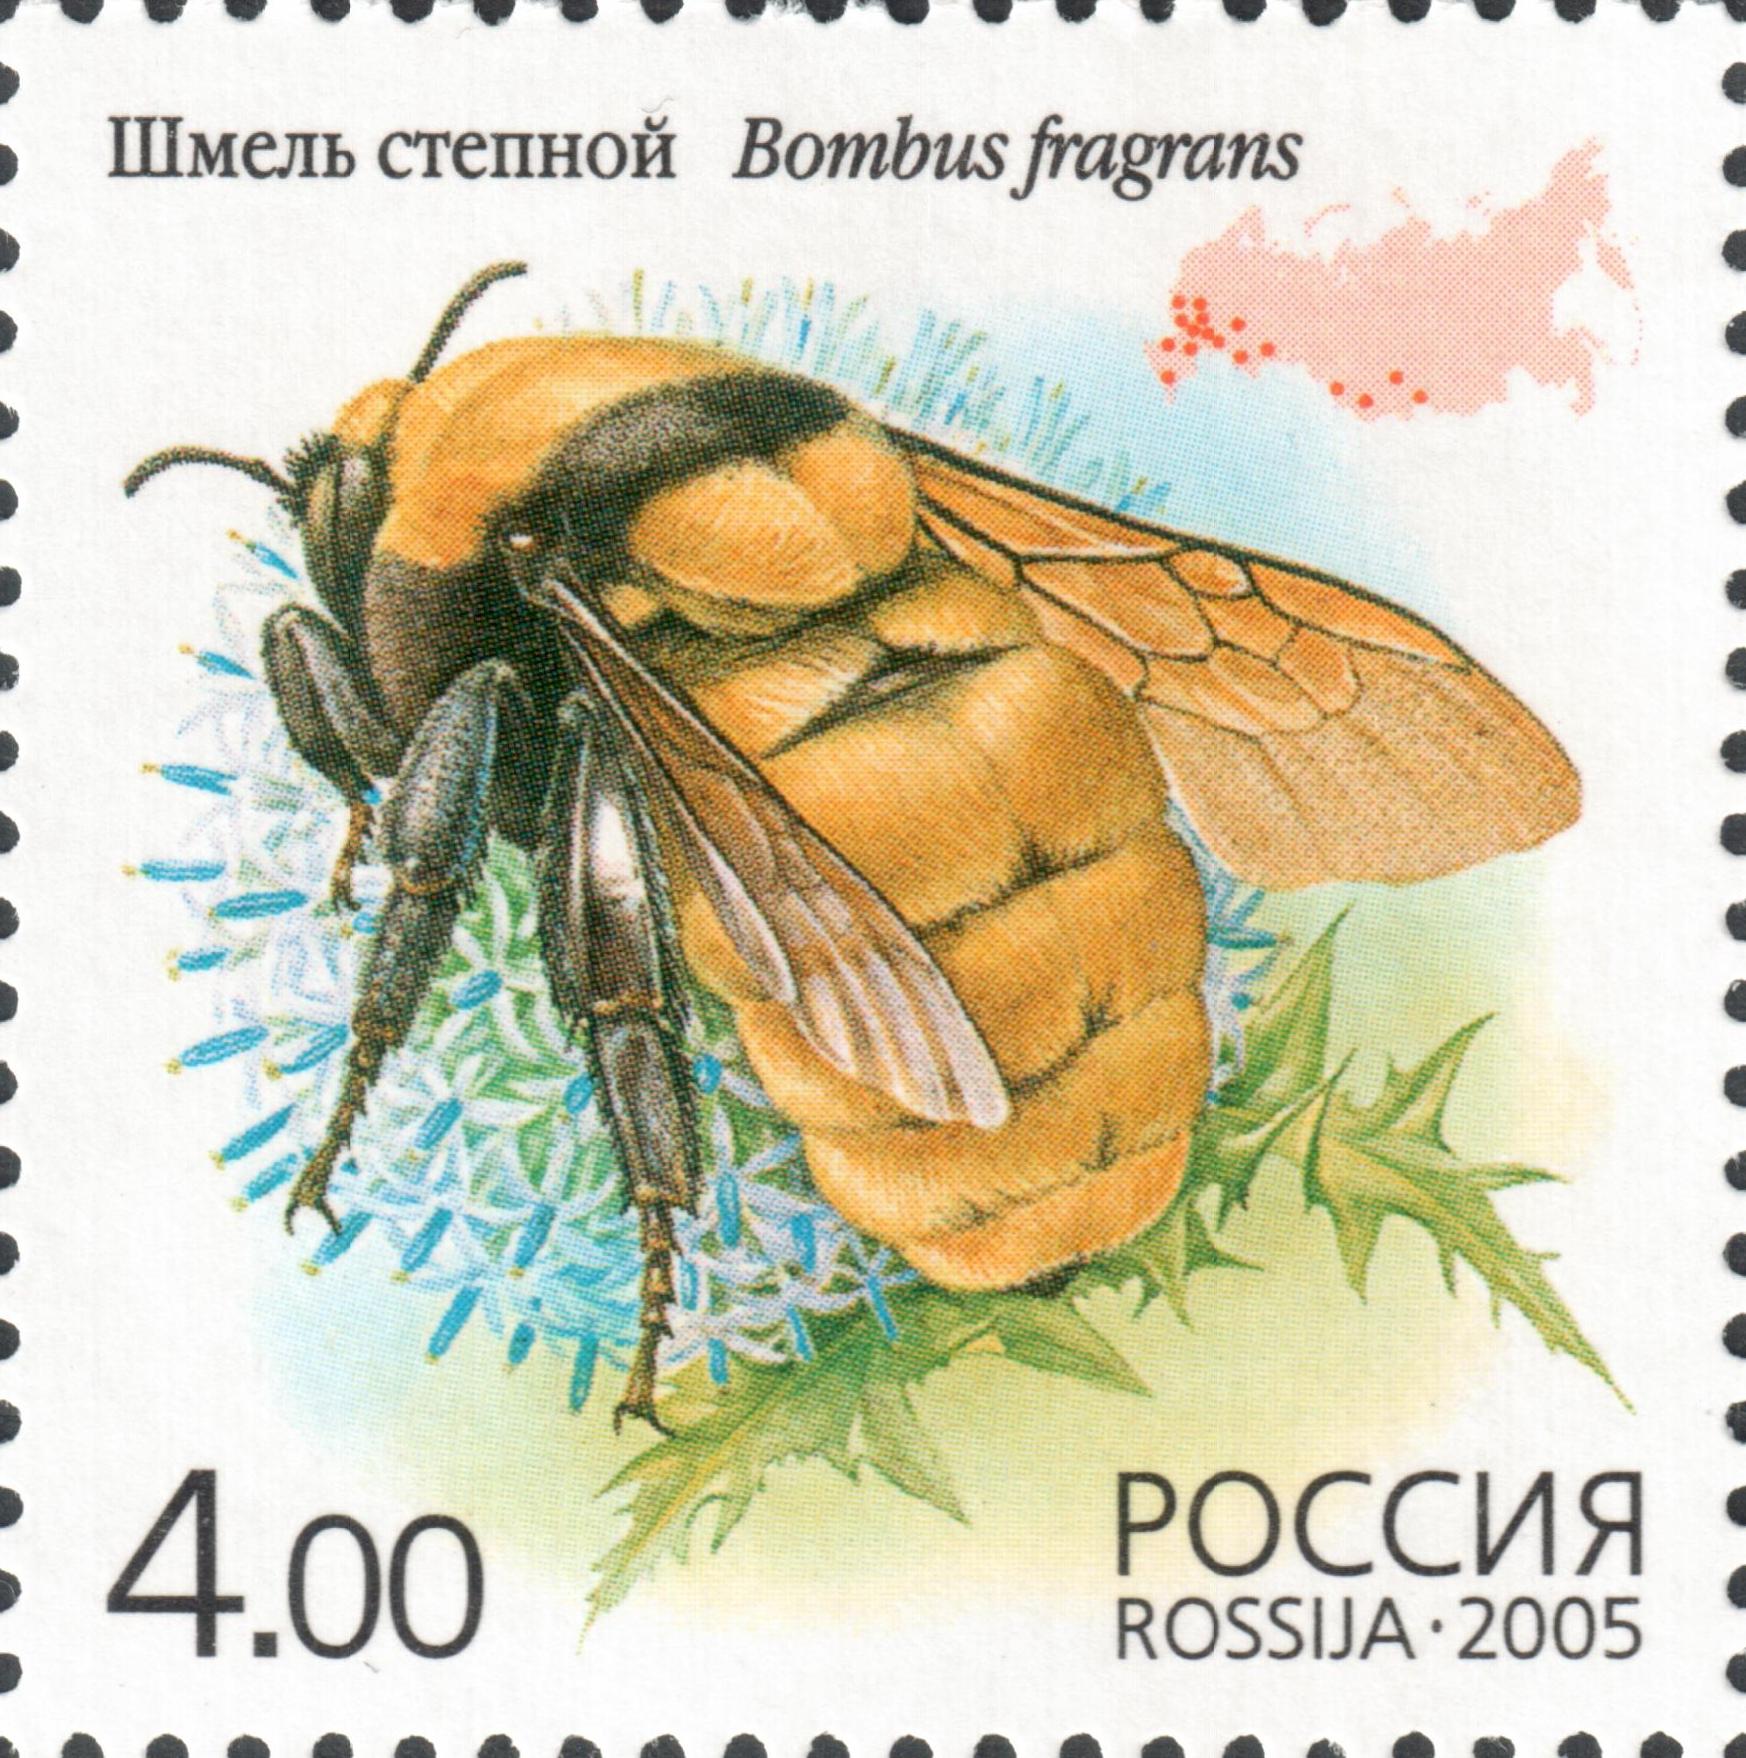 Шмель степной (Bombus fragrans)